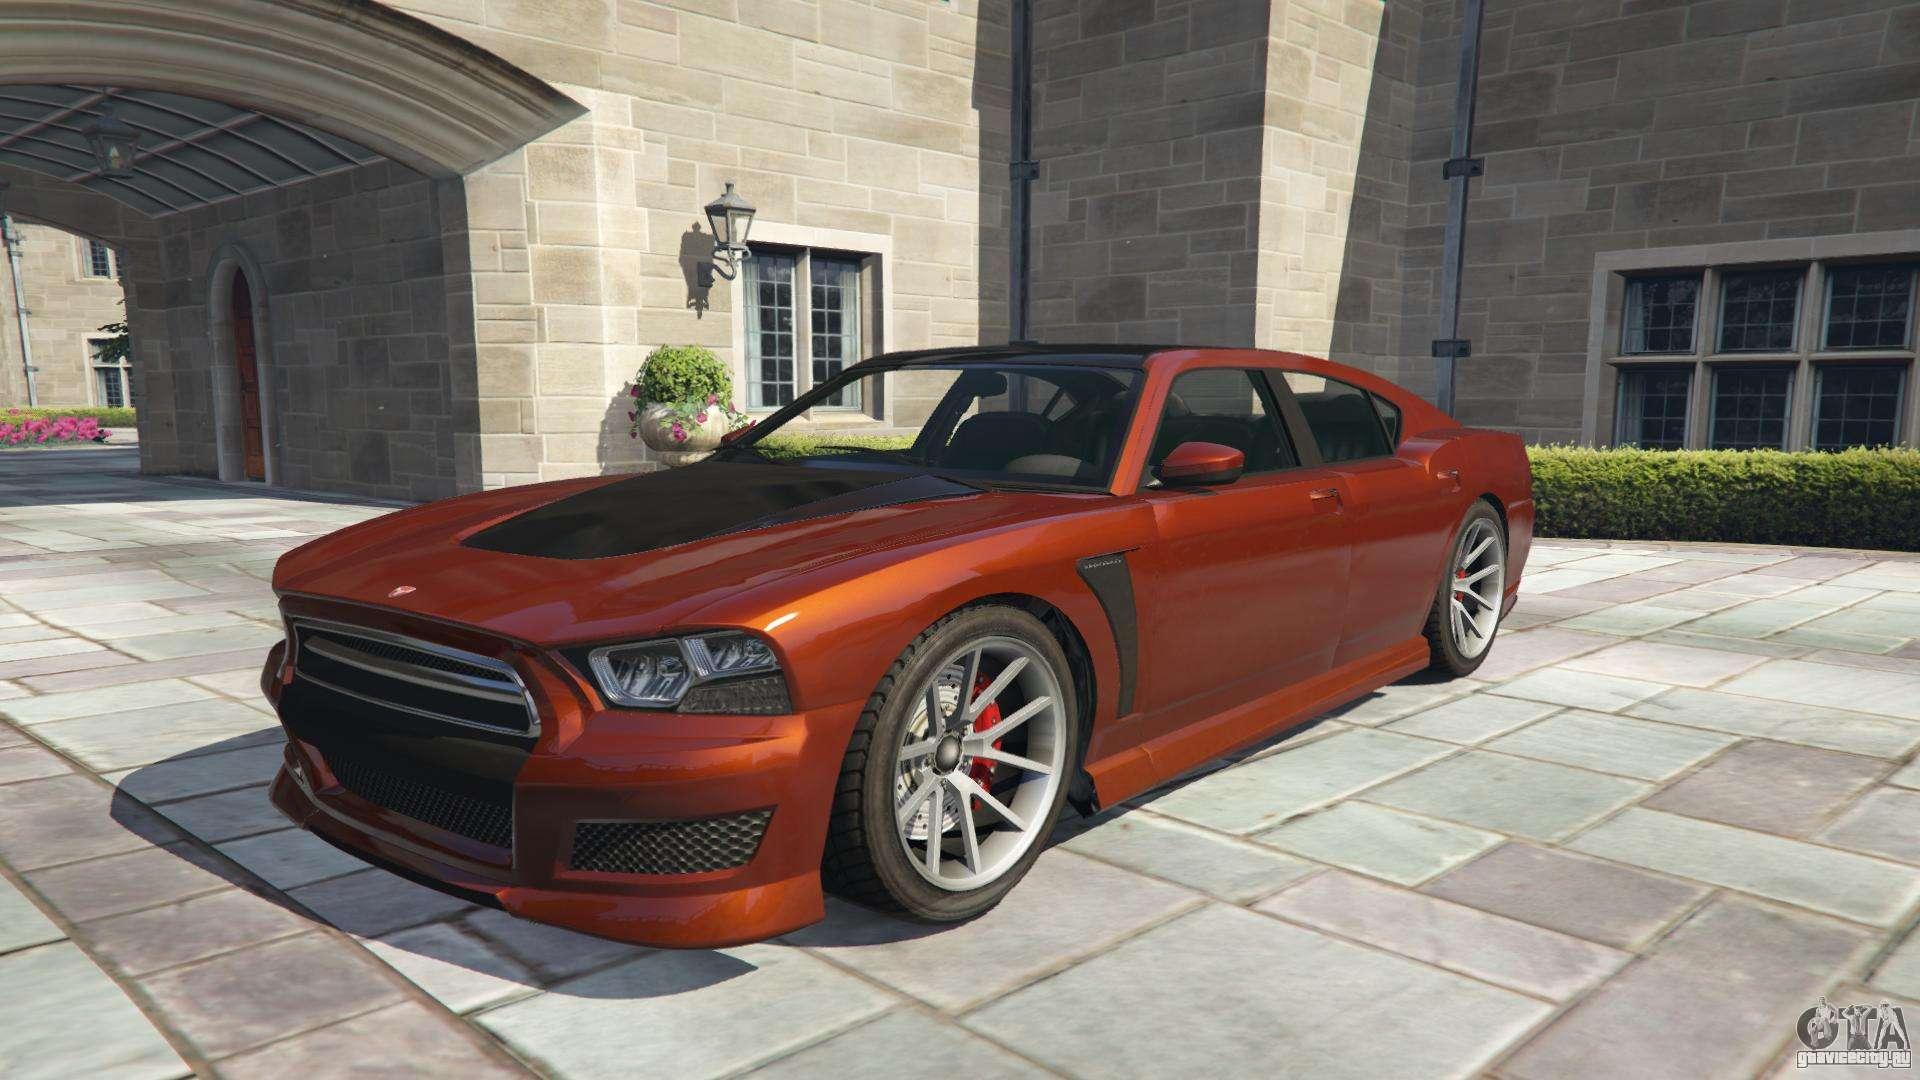 Bravado Buffalo S из GTA 5 - вид спереди